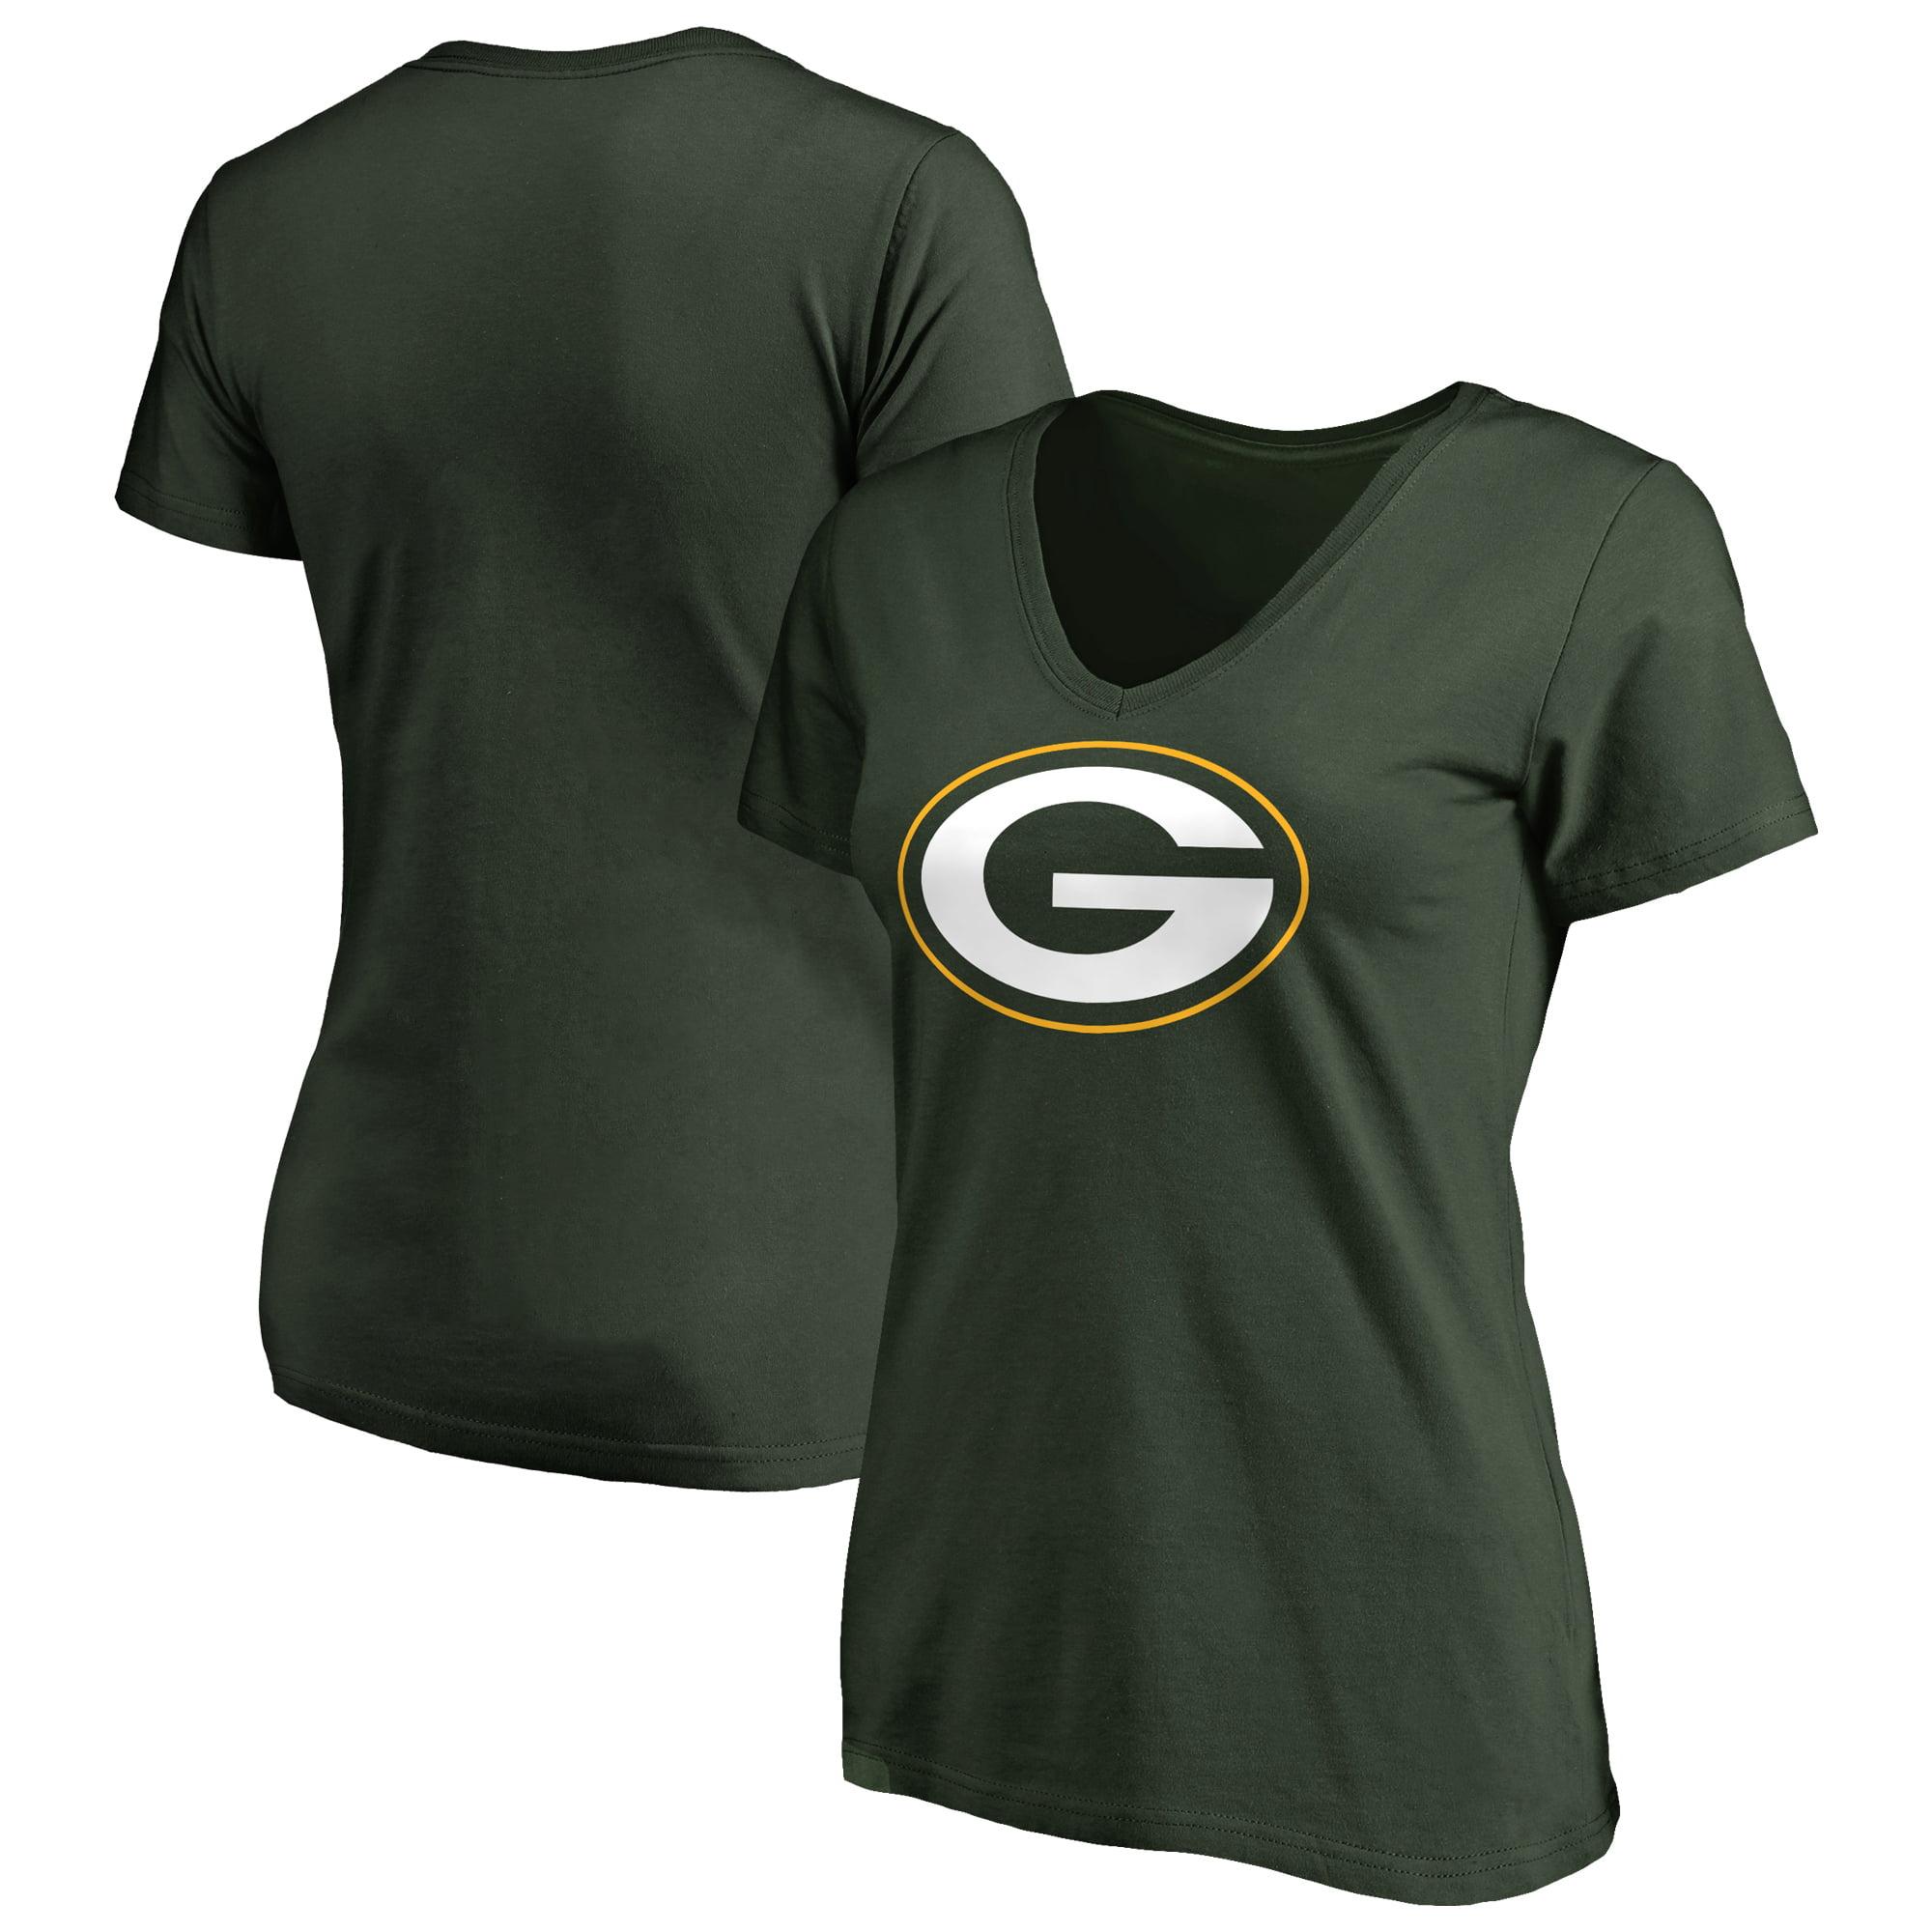 Green Bay Packers NFL Pro Line Women's Primary Logo V-Neck T-Shirt - Green